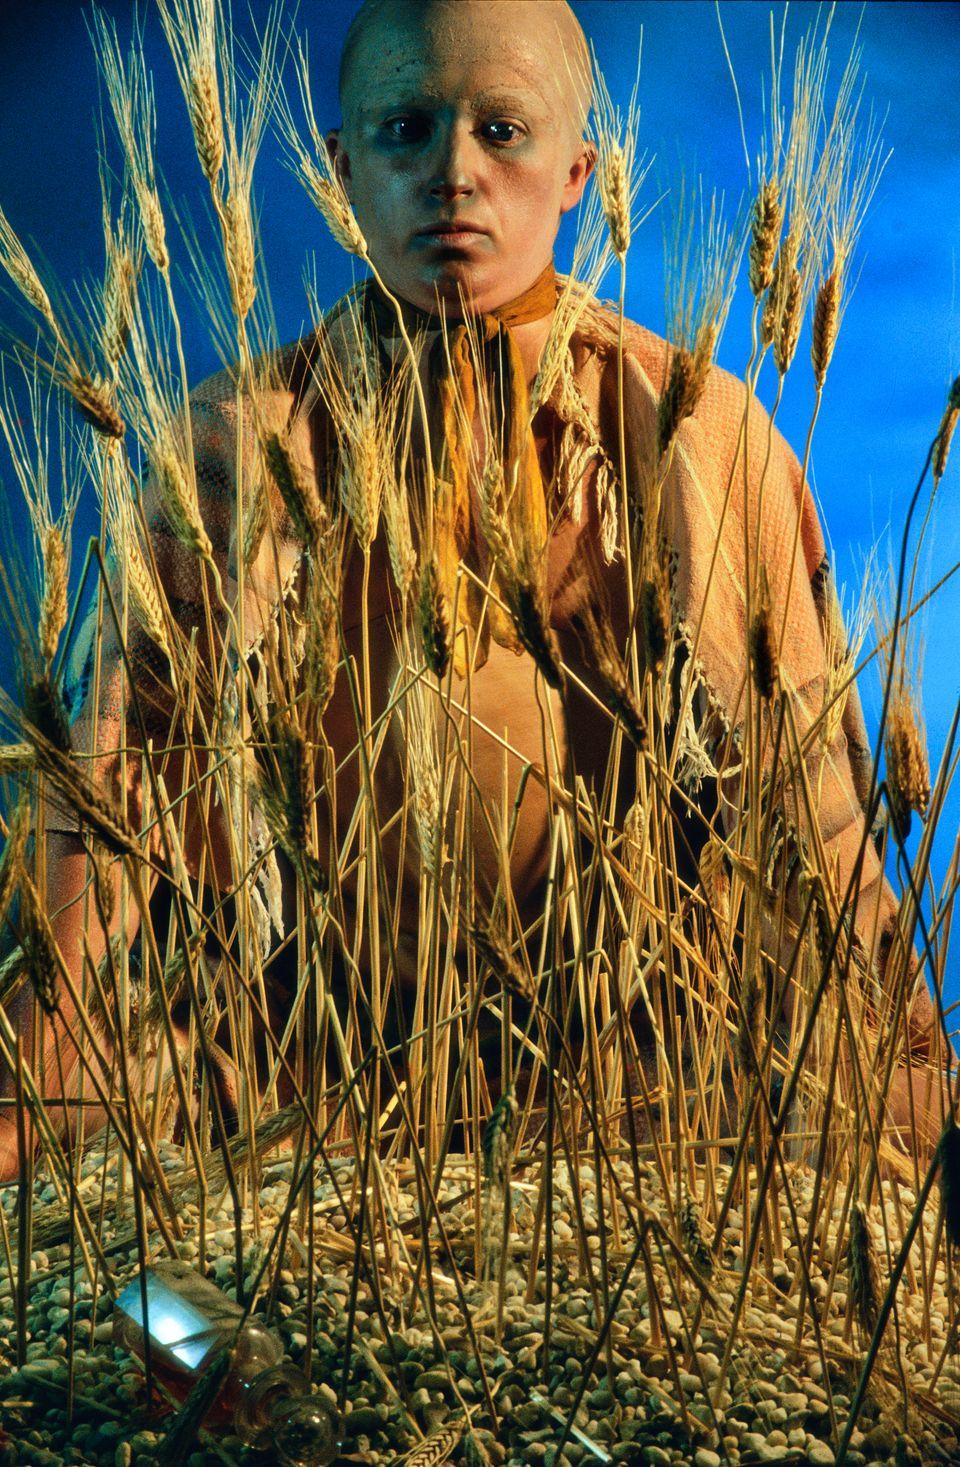 Cindy Sherman Untitled #152 1985 Fargefotografi/C-print / Chromogenic colour print 184,2 x 125,4 cm Astrup Fearnley Samlingen